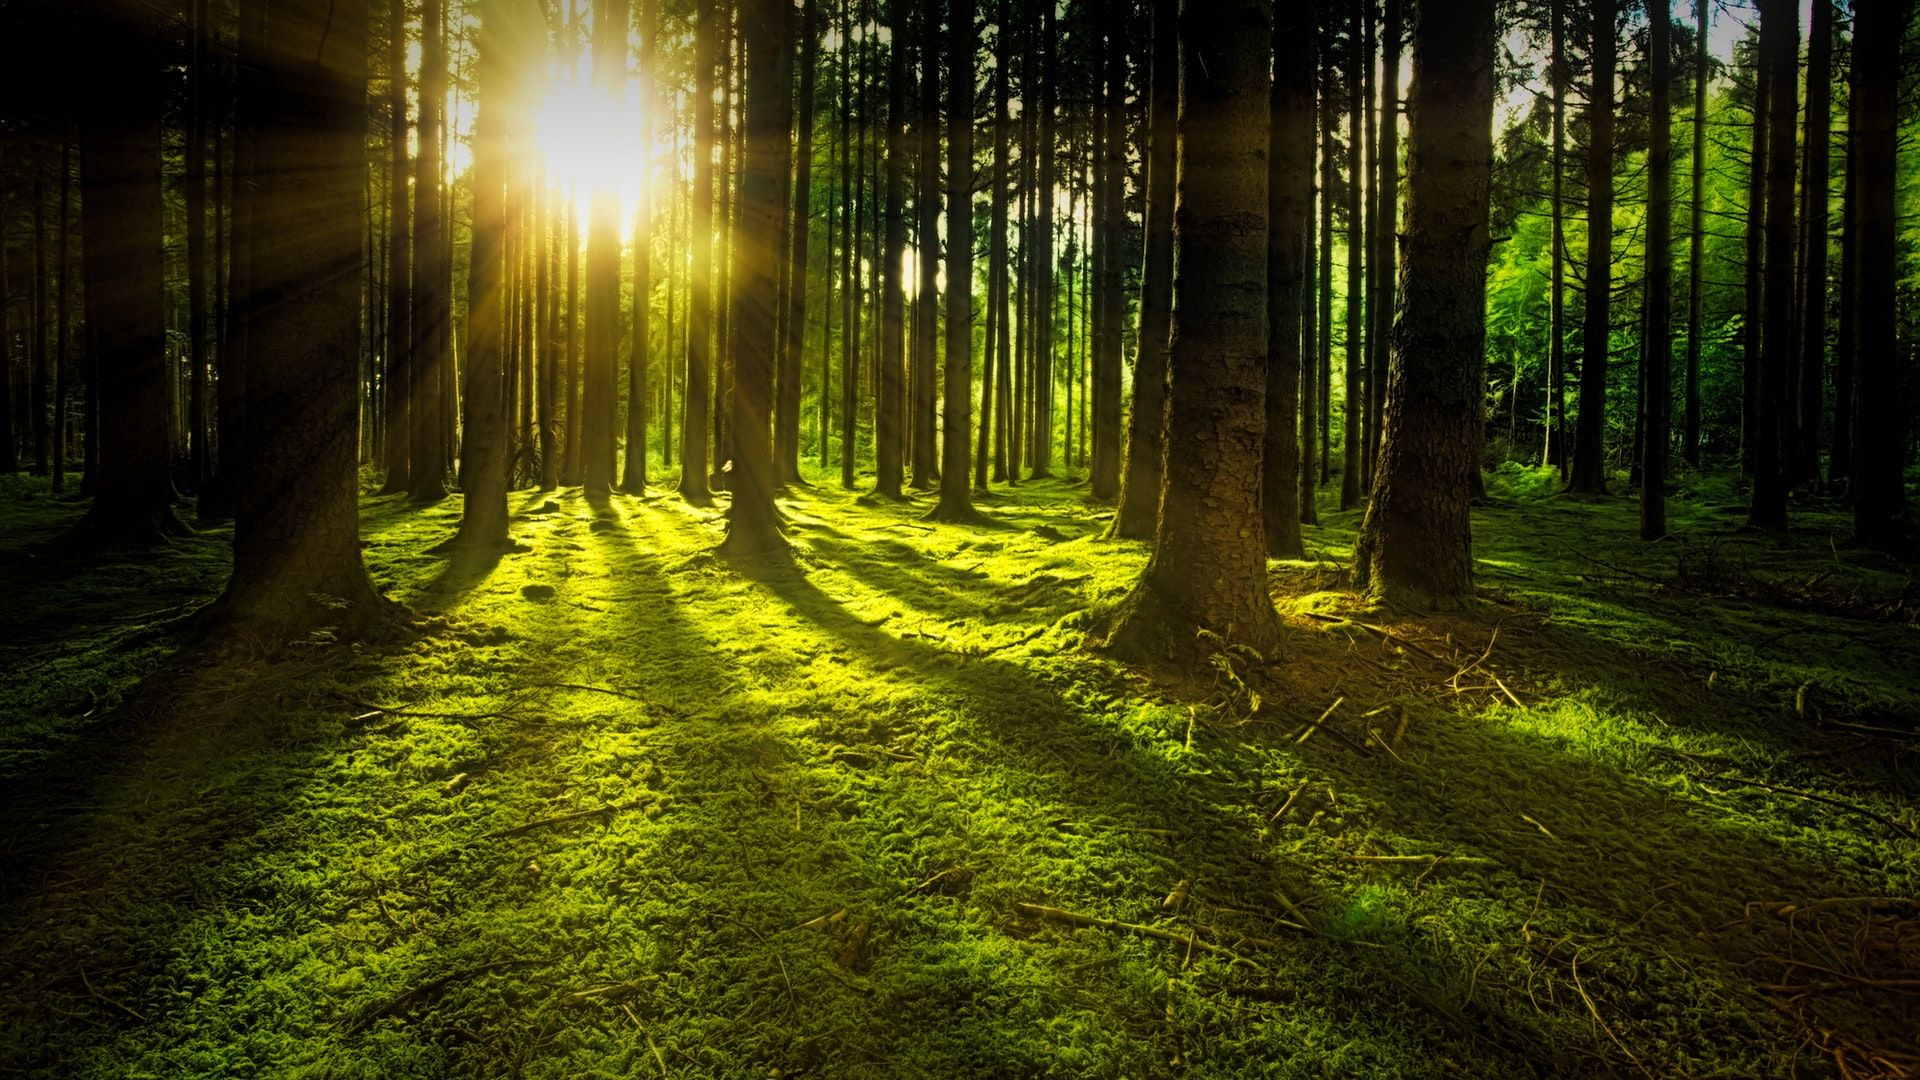 عکس زمینه غروب آفتاب در جنگل پس زمینه